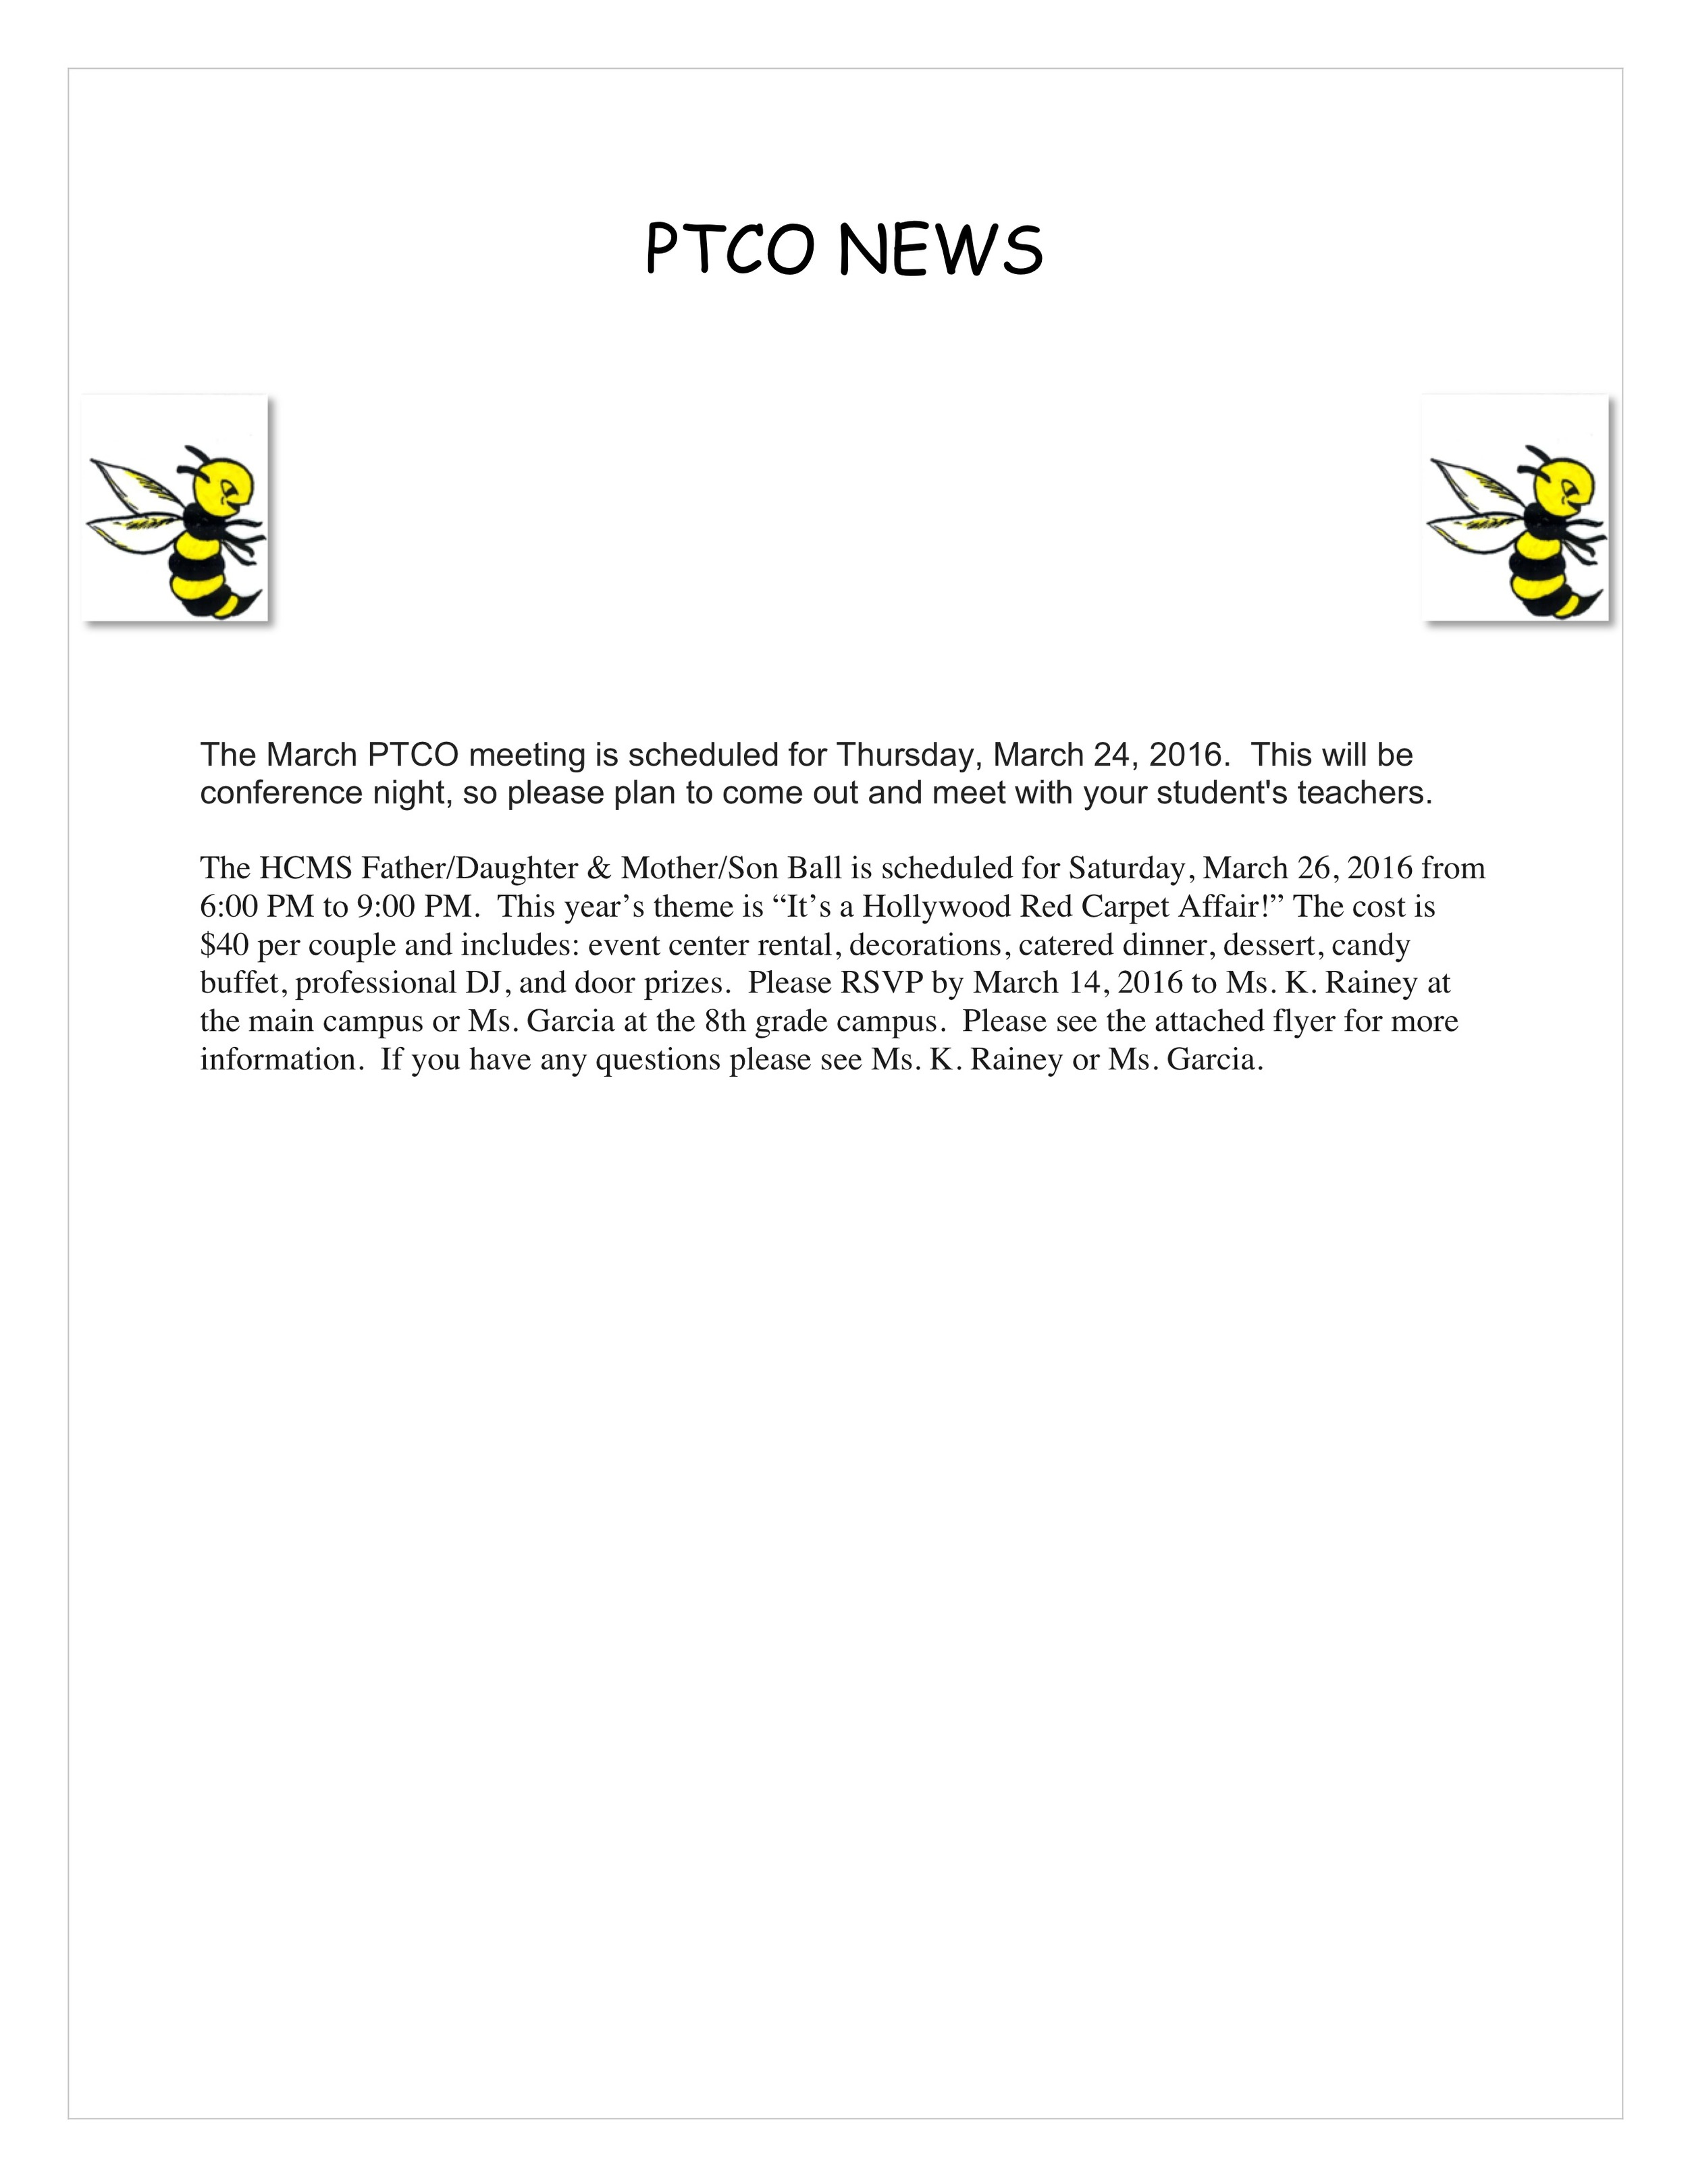 February 29, 2016 Newsletter 8th Grade 3pdf-image.jpeg